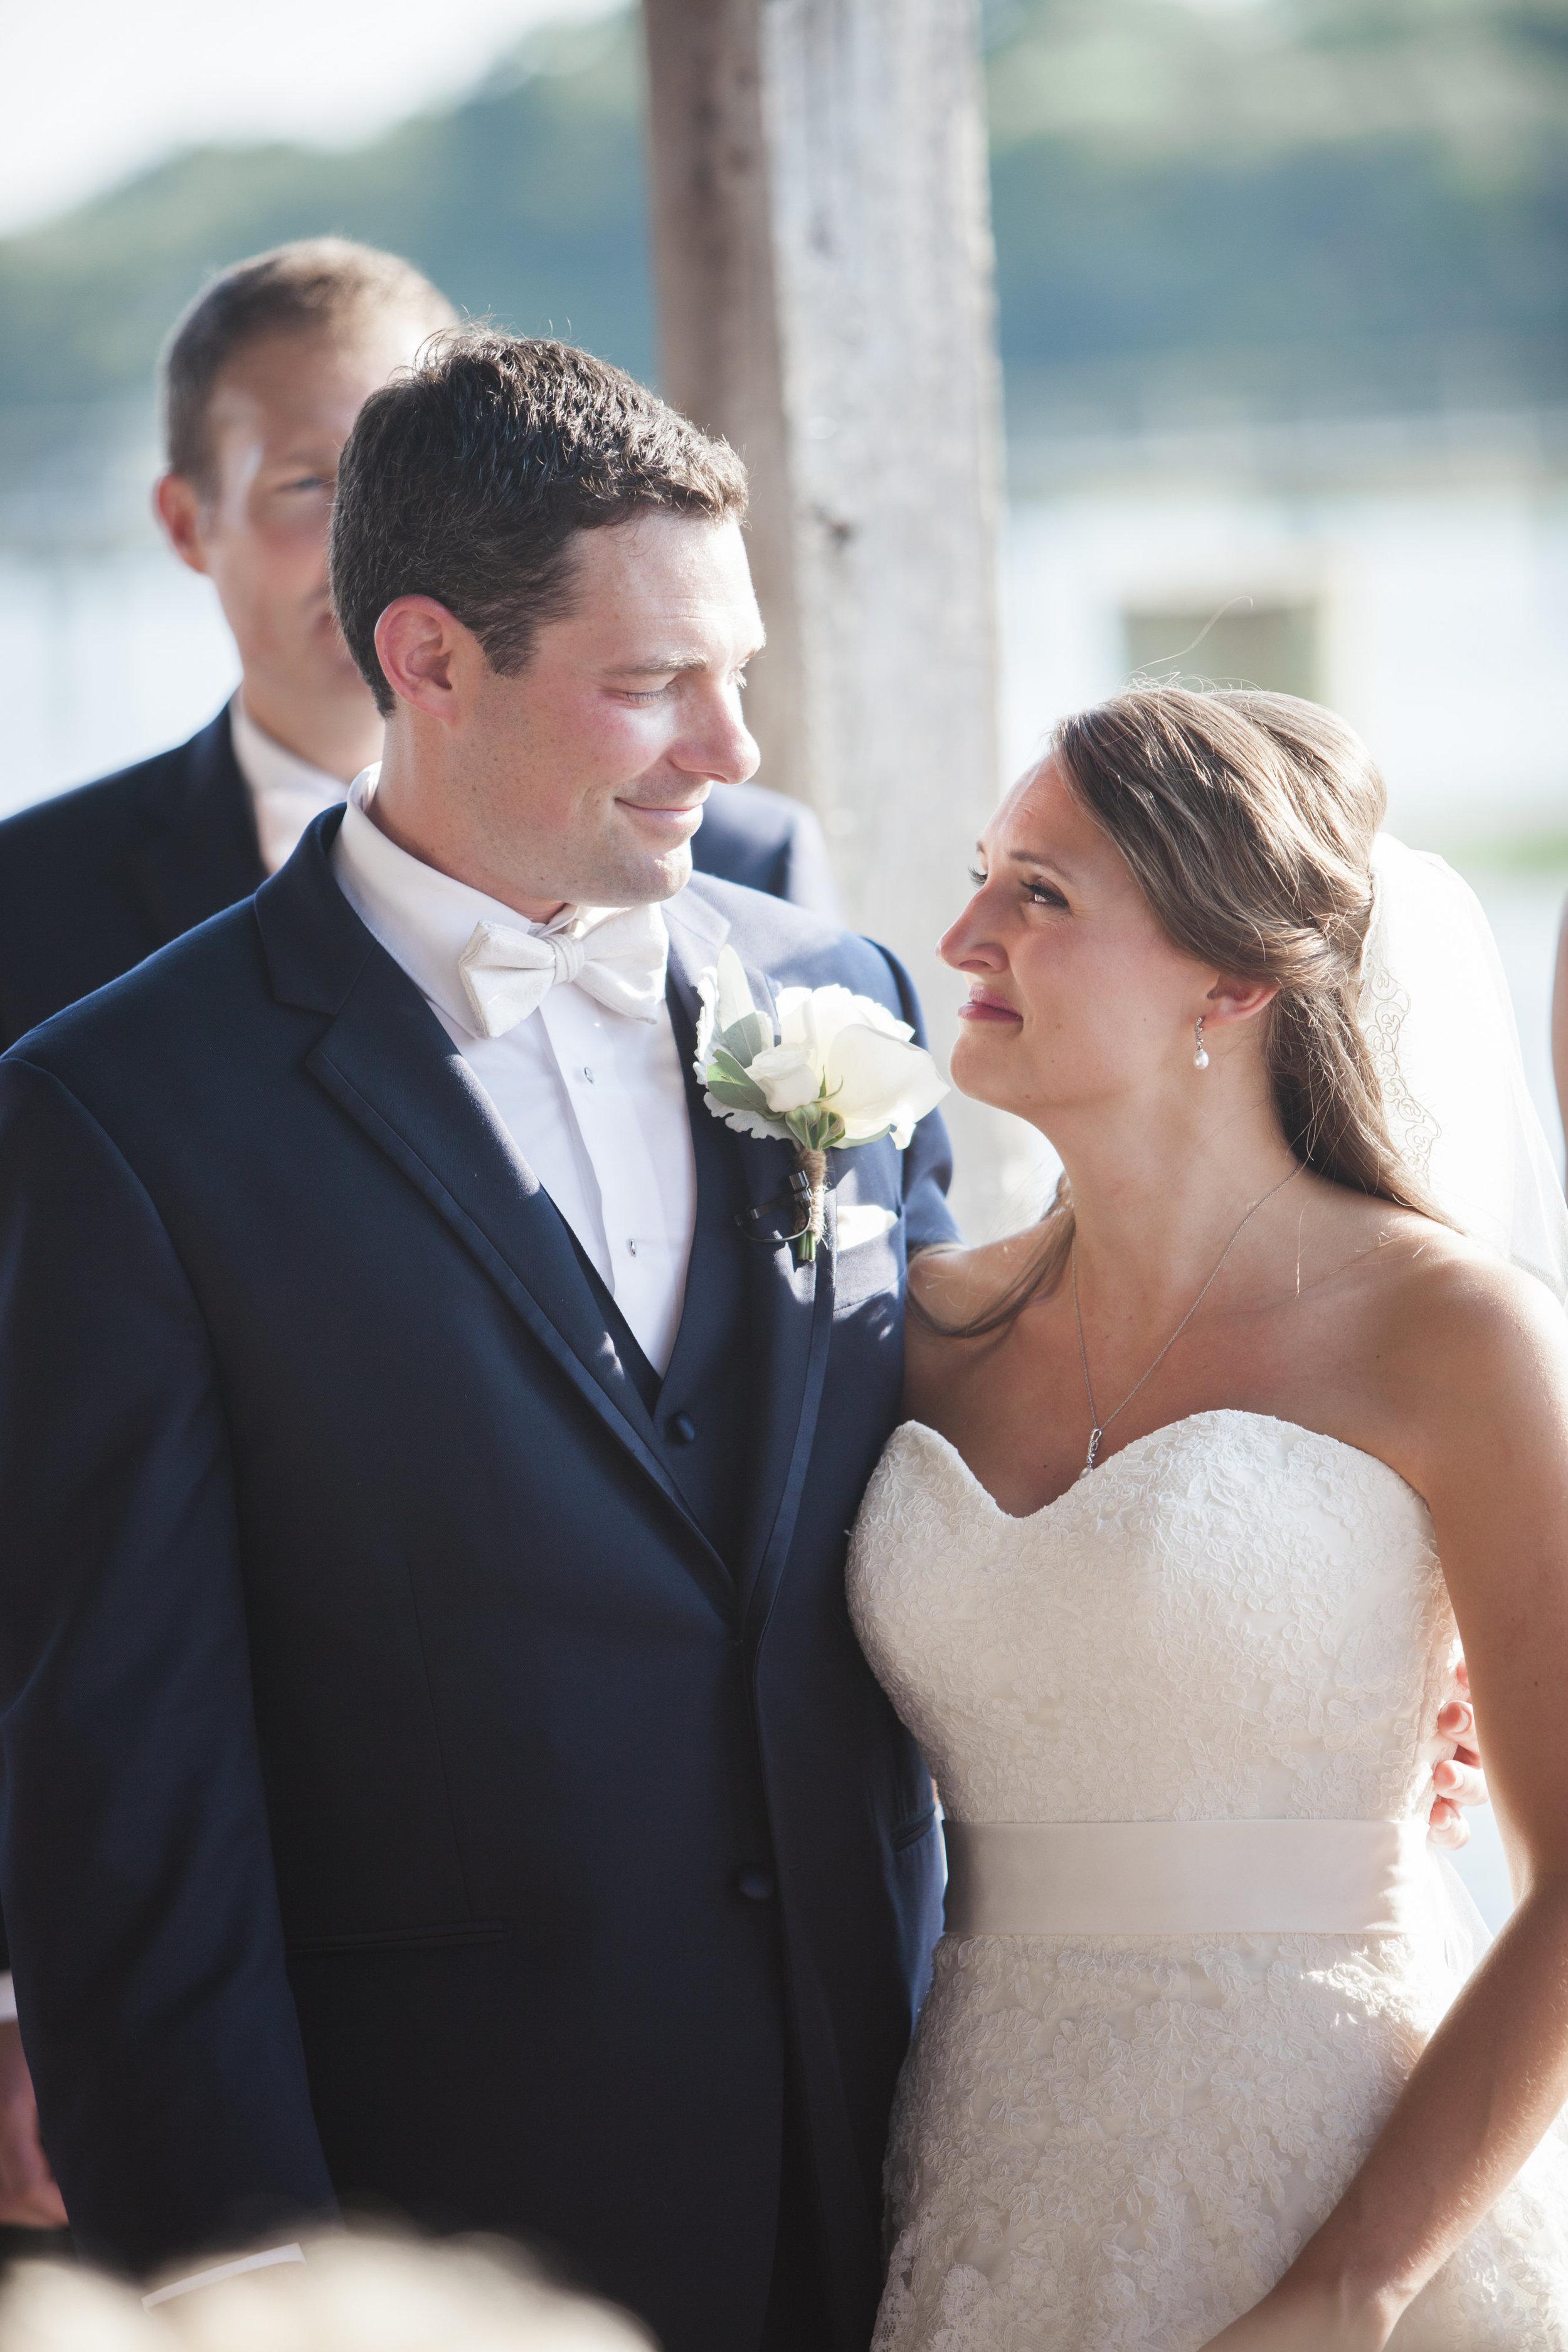 Charleston wedding at Boone Hall Plantation in South Carolina by Jarrad Lister Photography